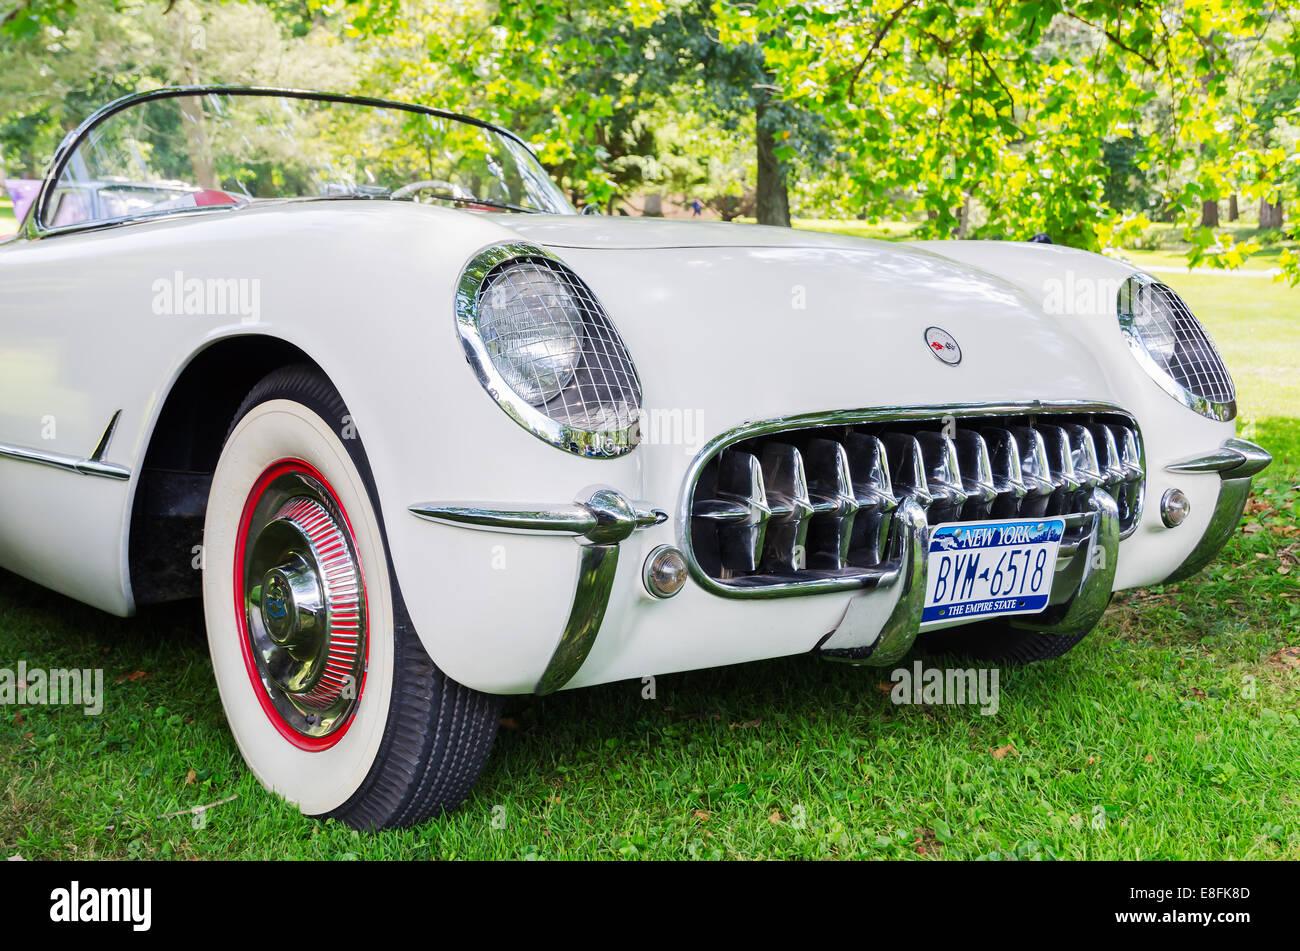 Classic 50's American Car. - Stock Image